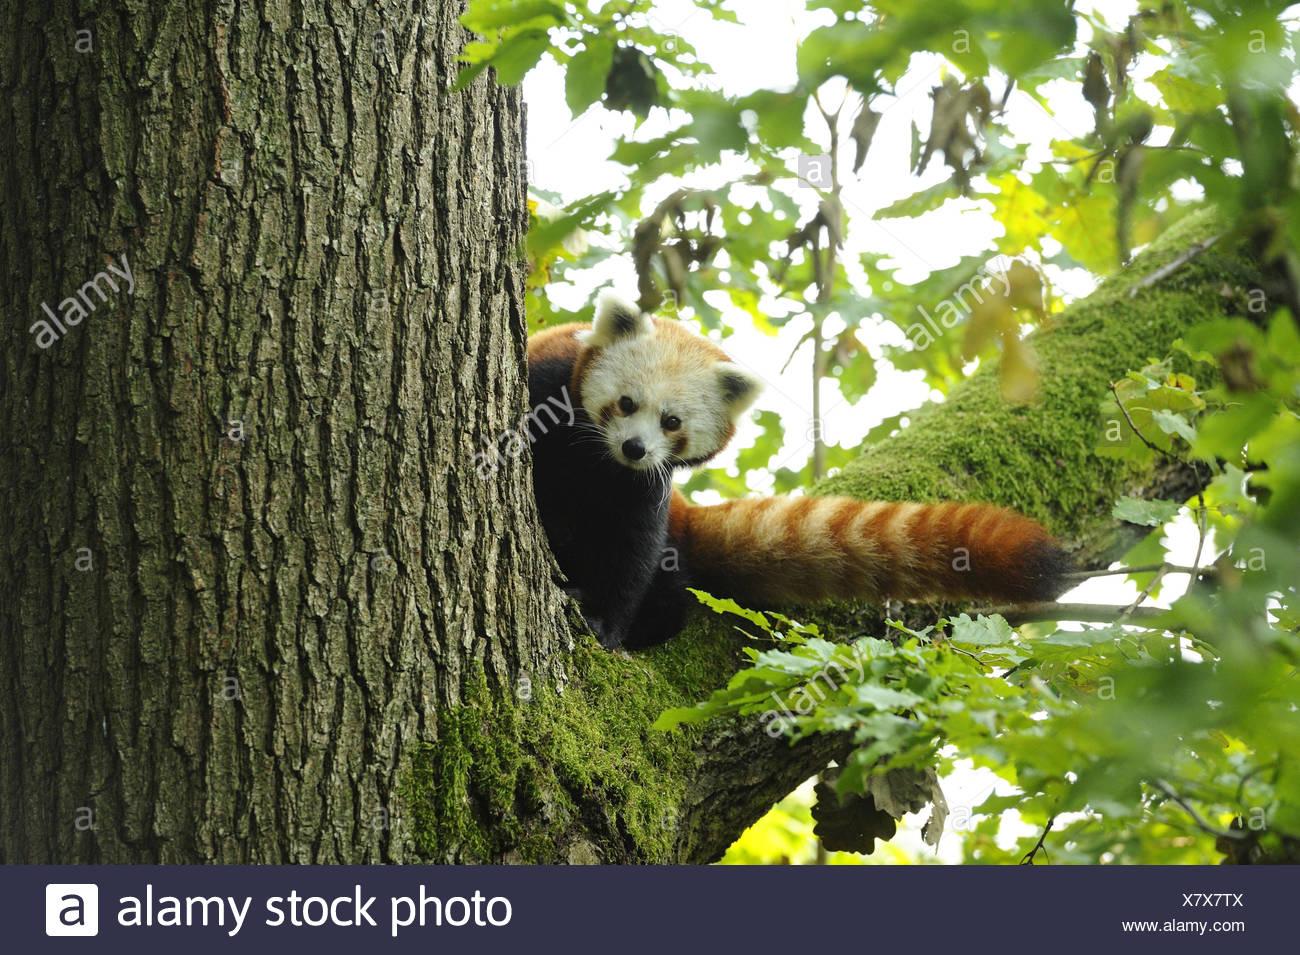 Le panda rouge, Ailurus fulgens, tronc, branche, assis, de face, looking at camera, Photo Stock